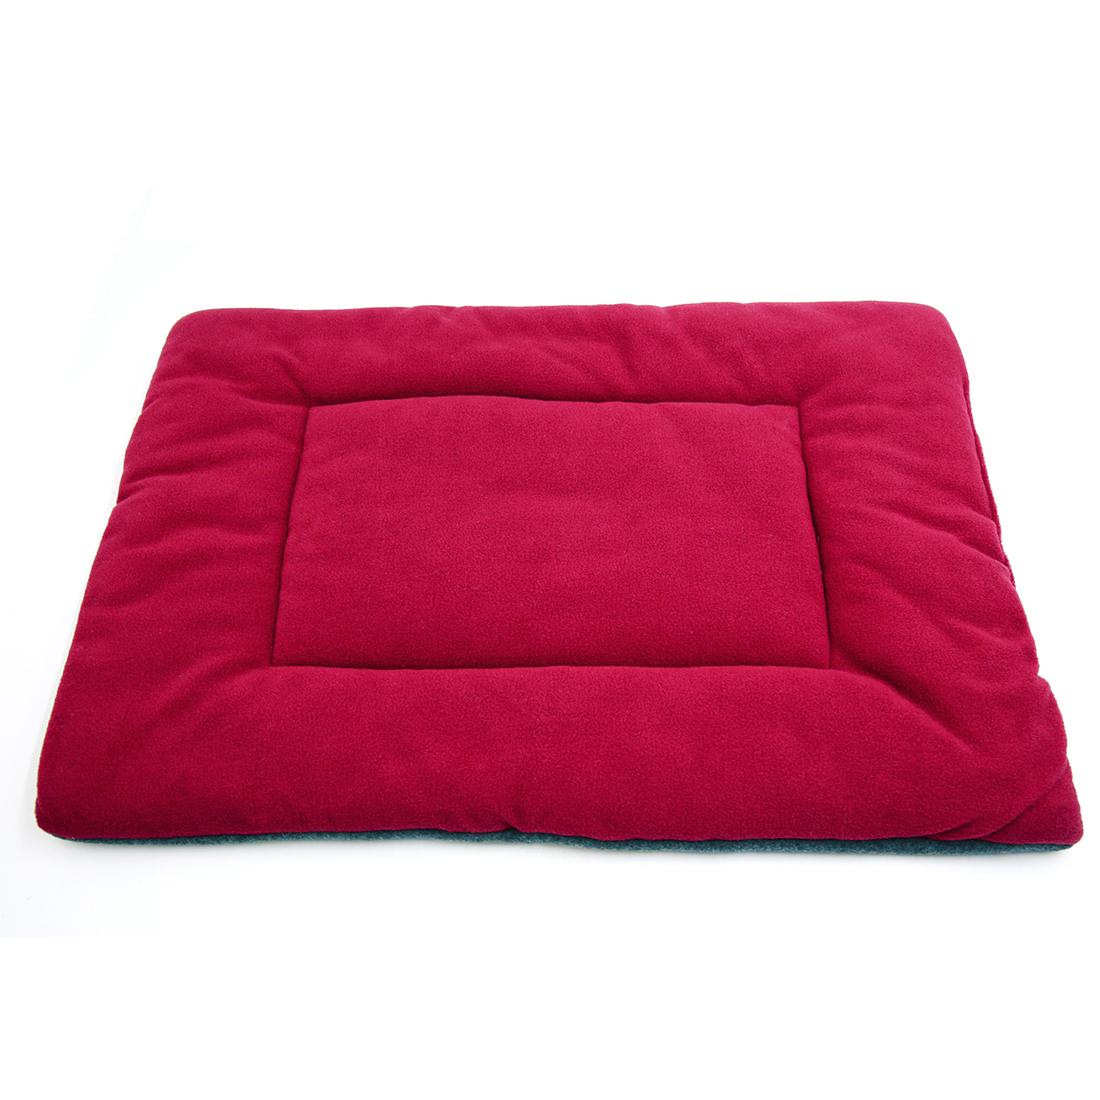 Fleece Reversible Mat Cushion Pad Bed for Dog Cat Puppy Pet Burgundy M